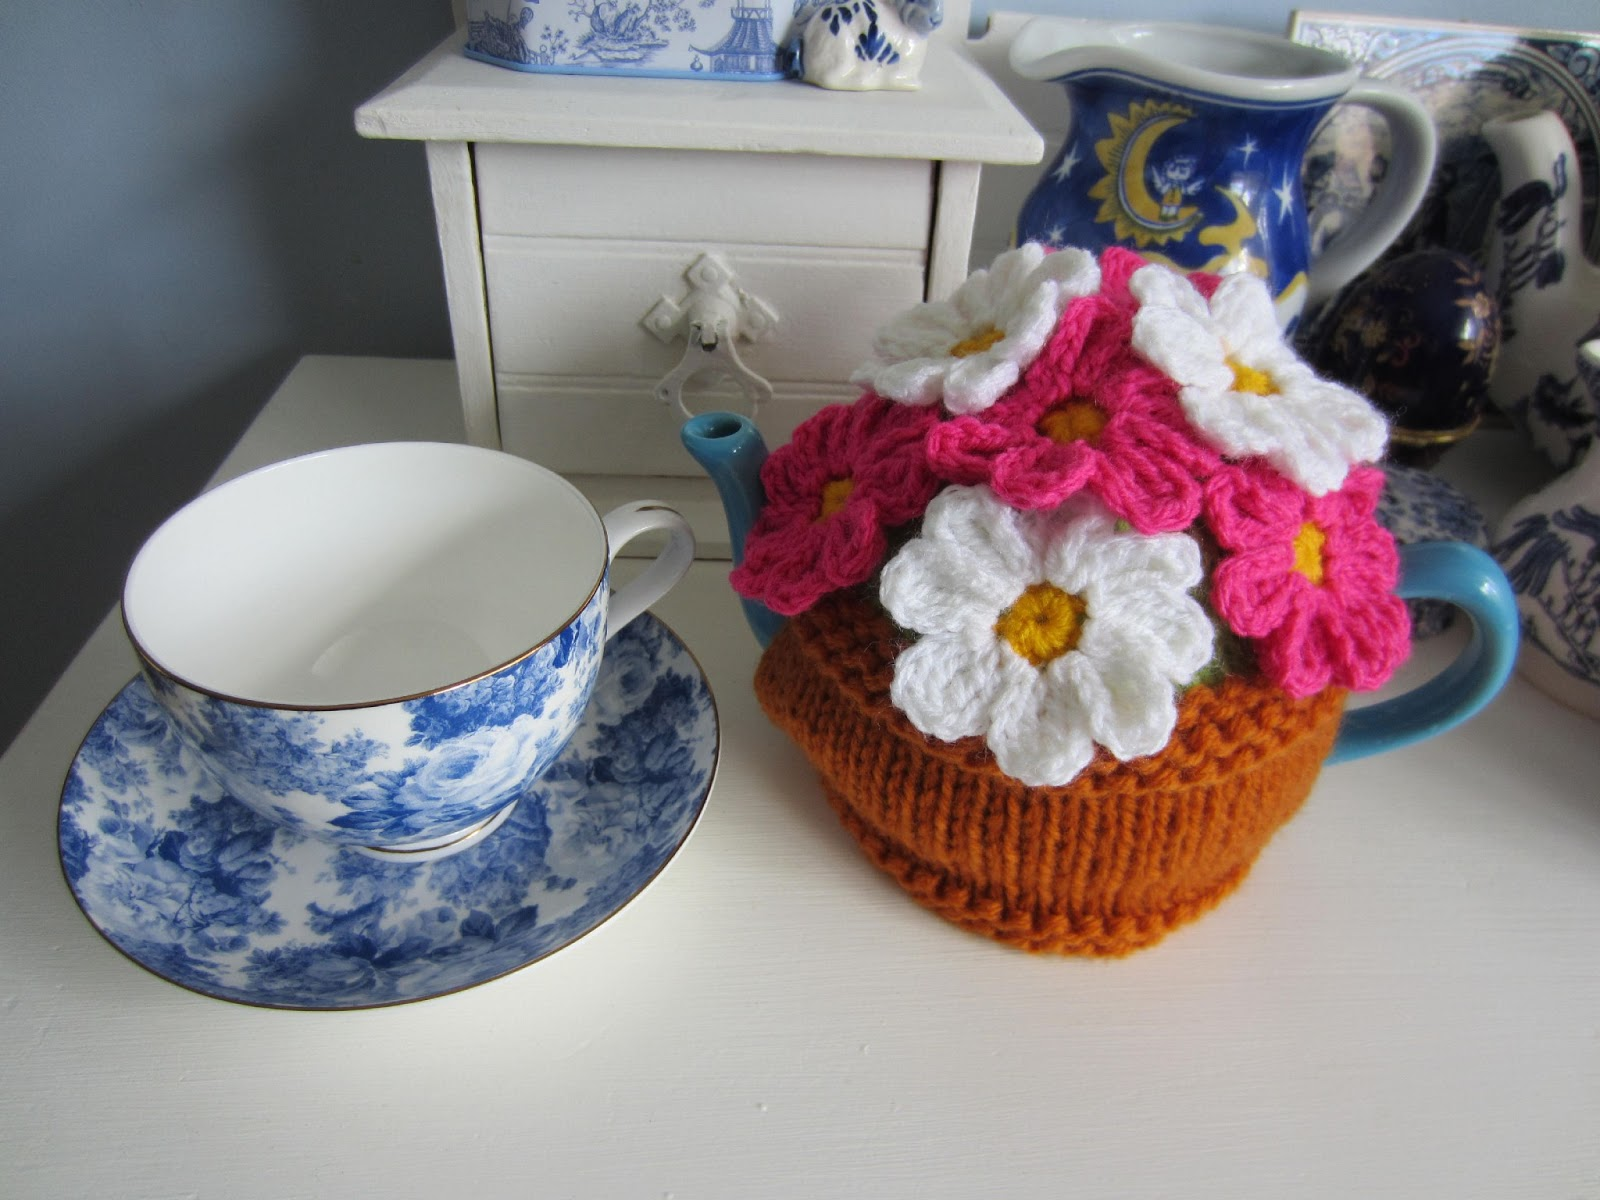 Justjen-knits&stitches: Flower Pot Tea Cosy